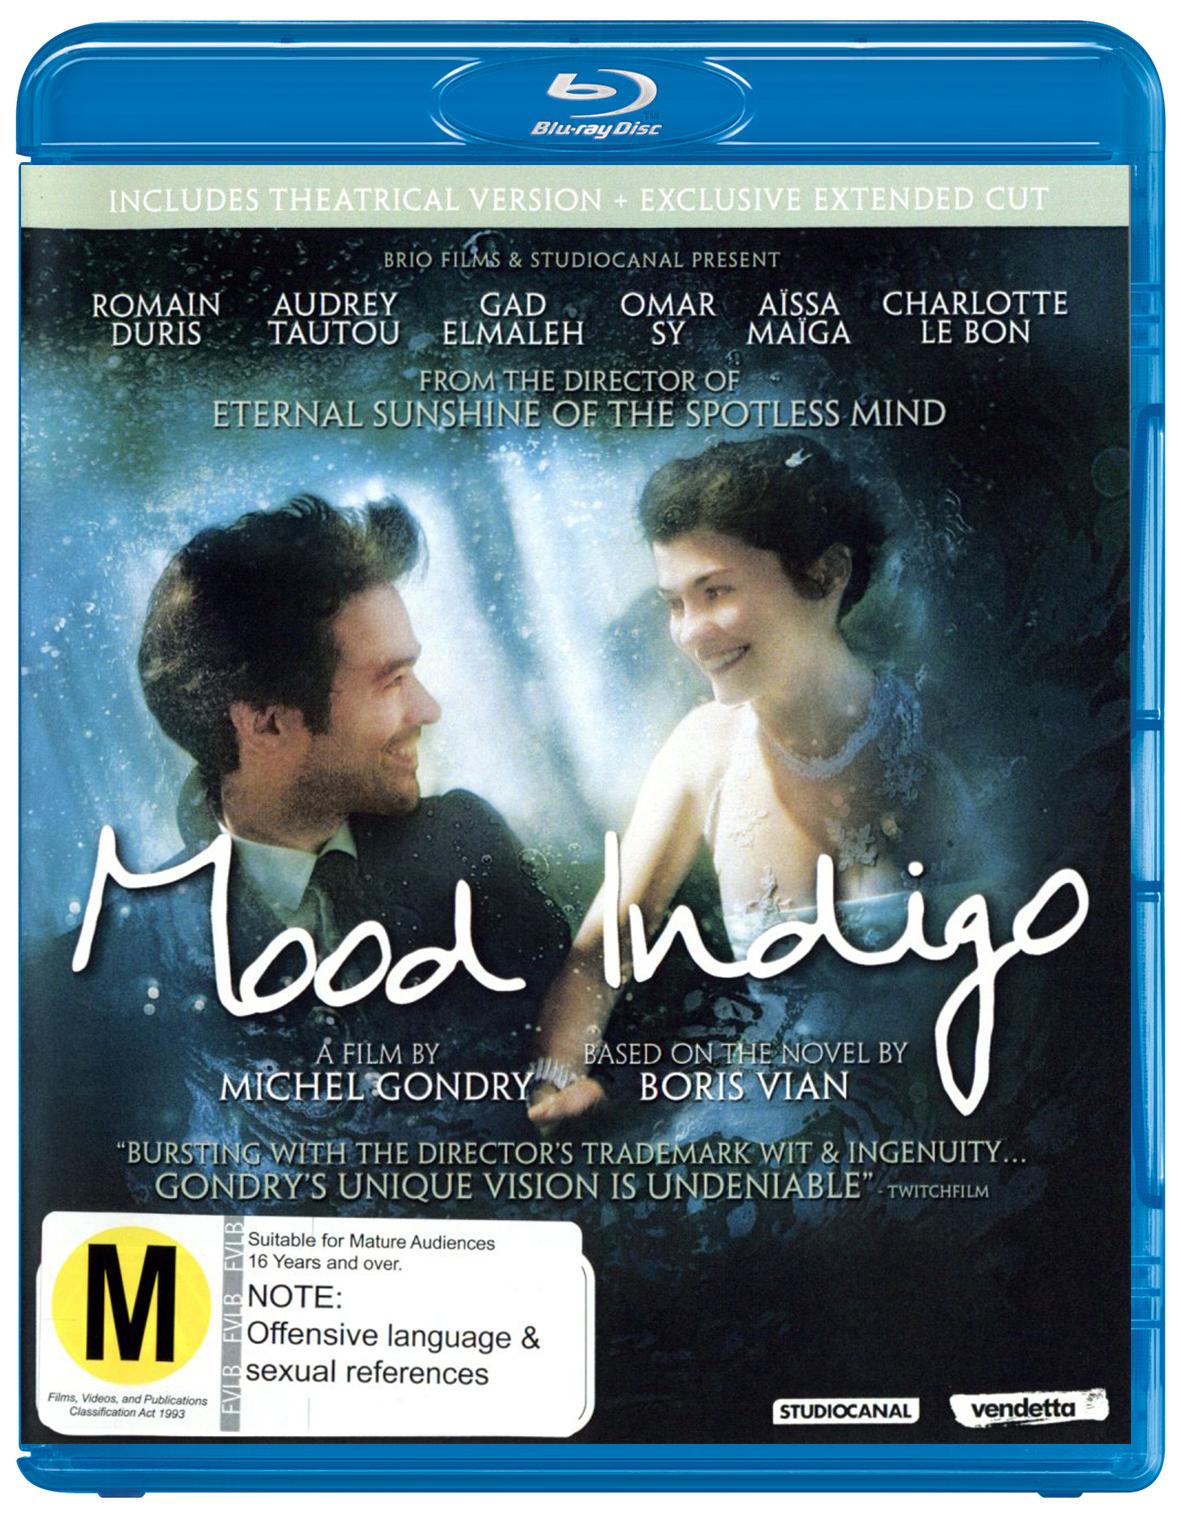 Mood Indigo on Blu-ray image